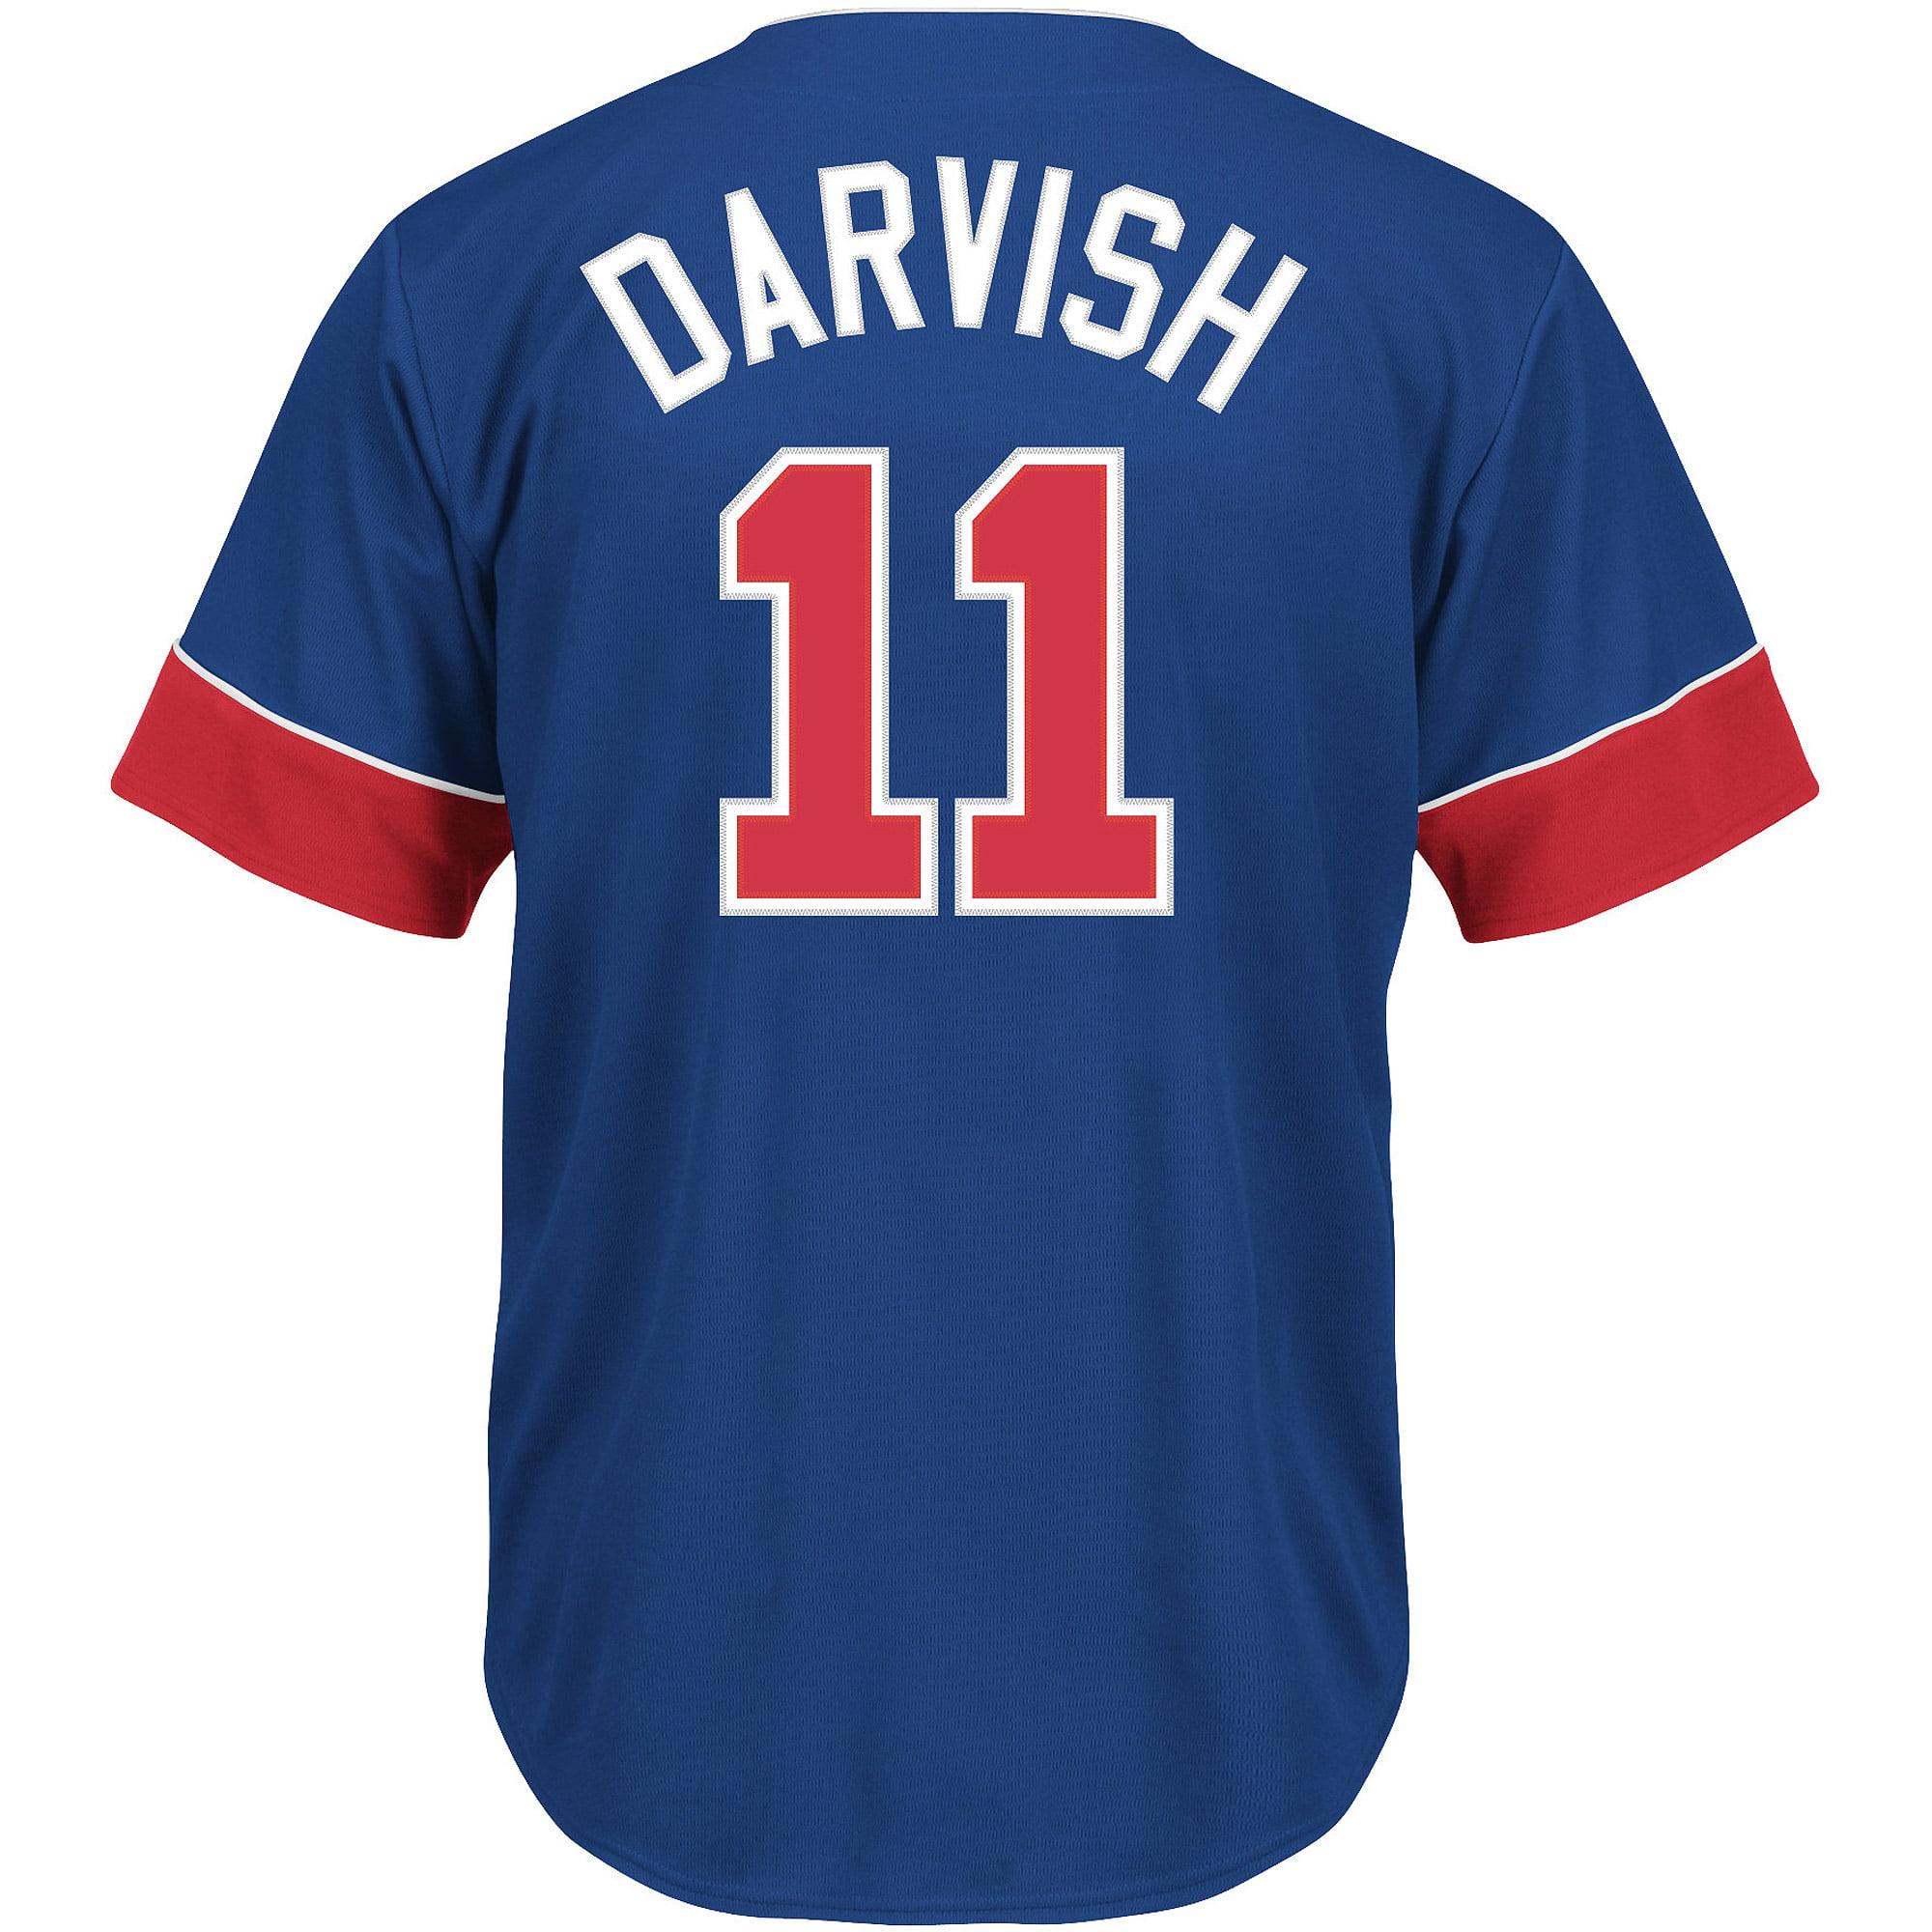 MLB Men's Texas Rangers Player Jersey